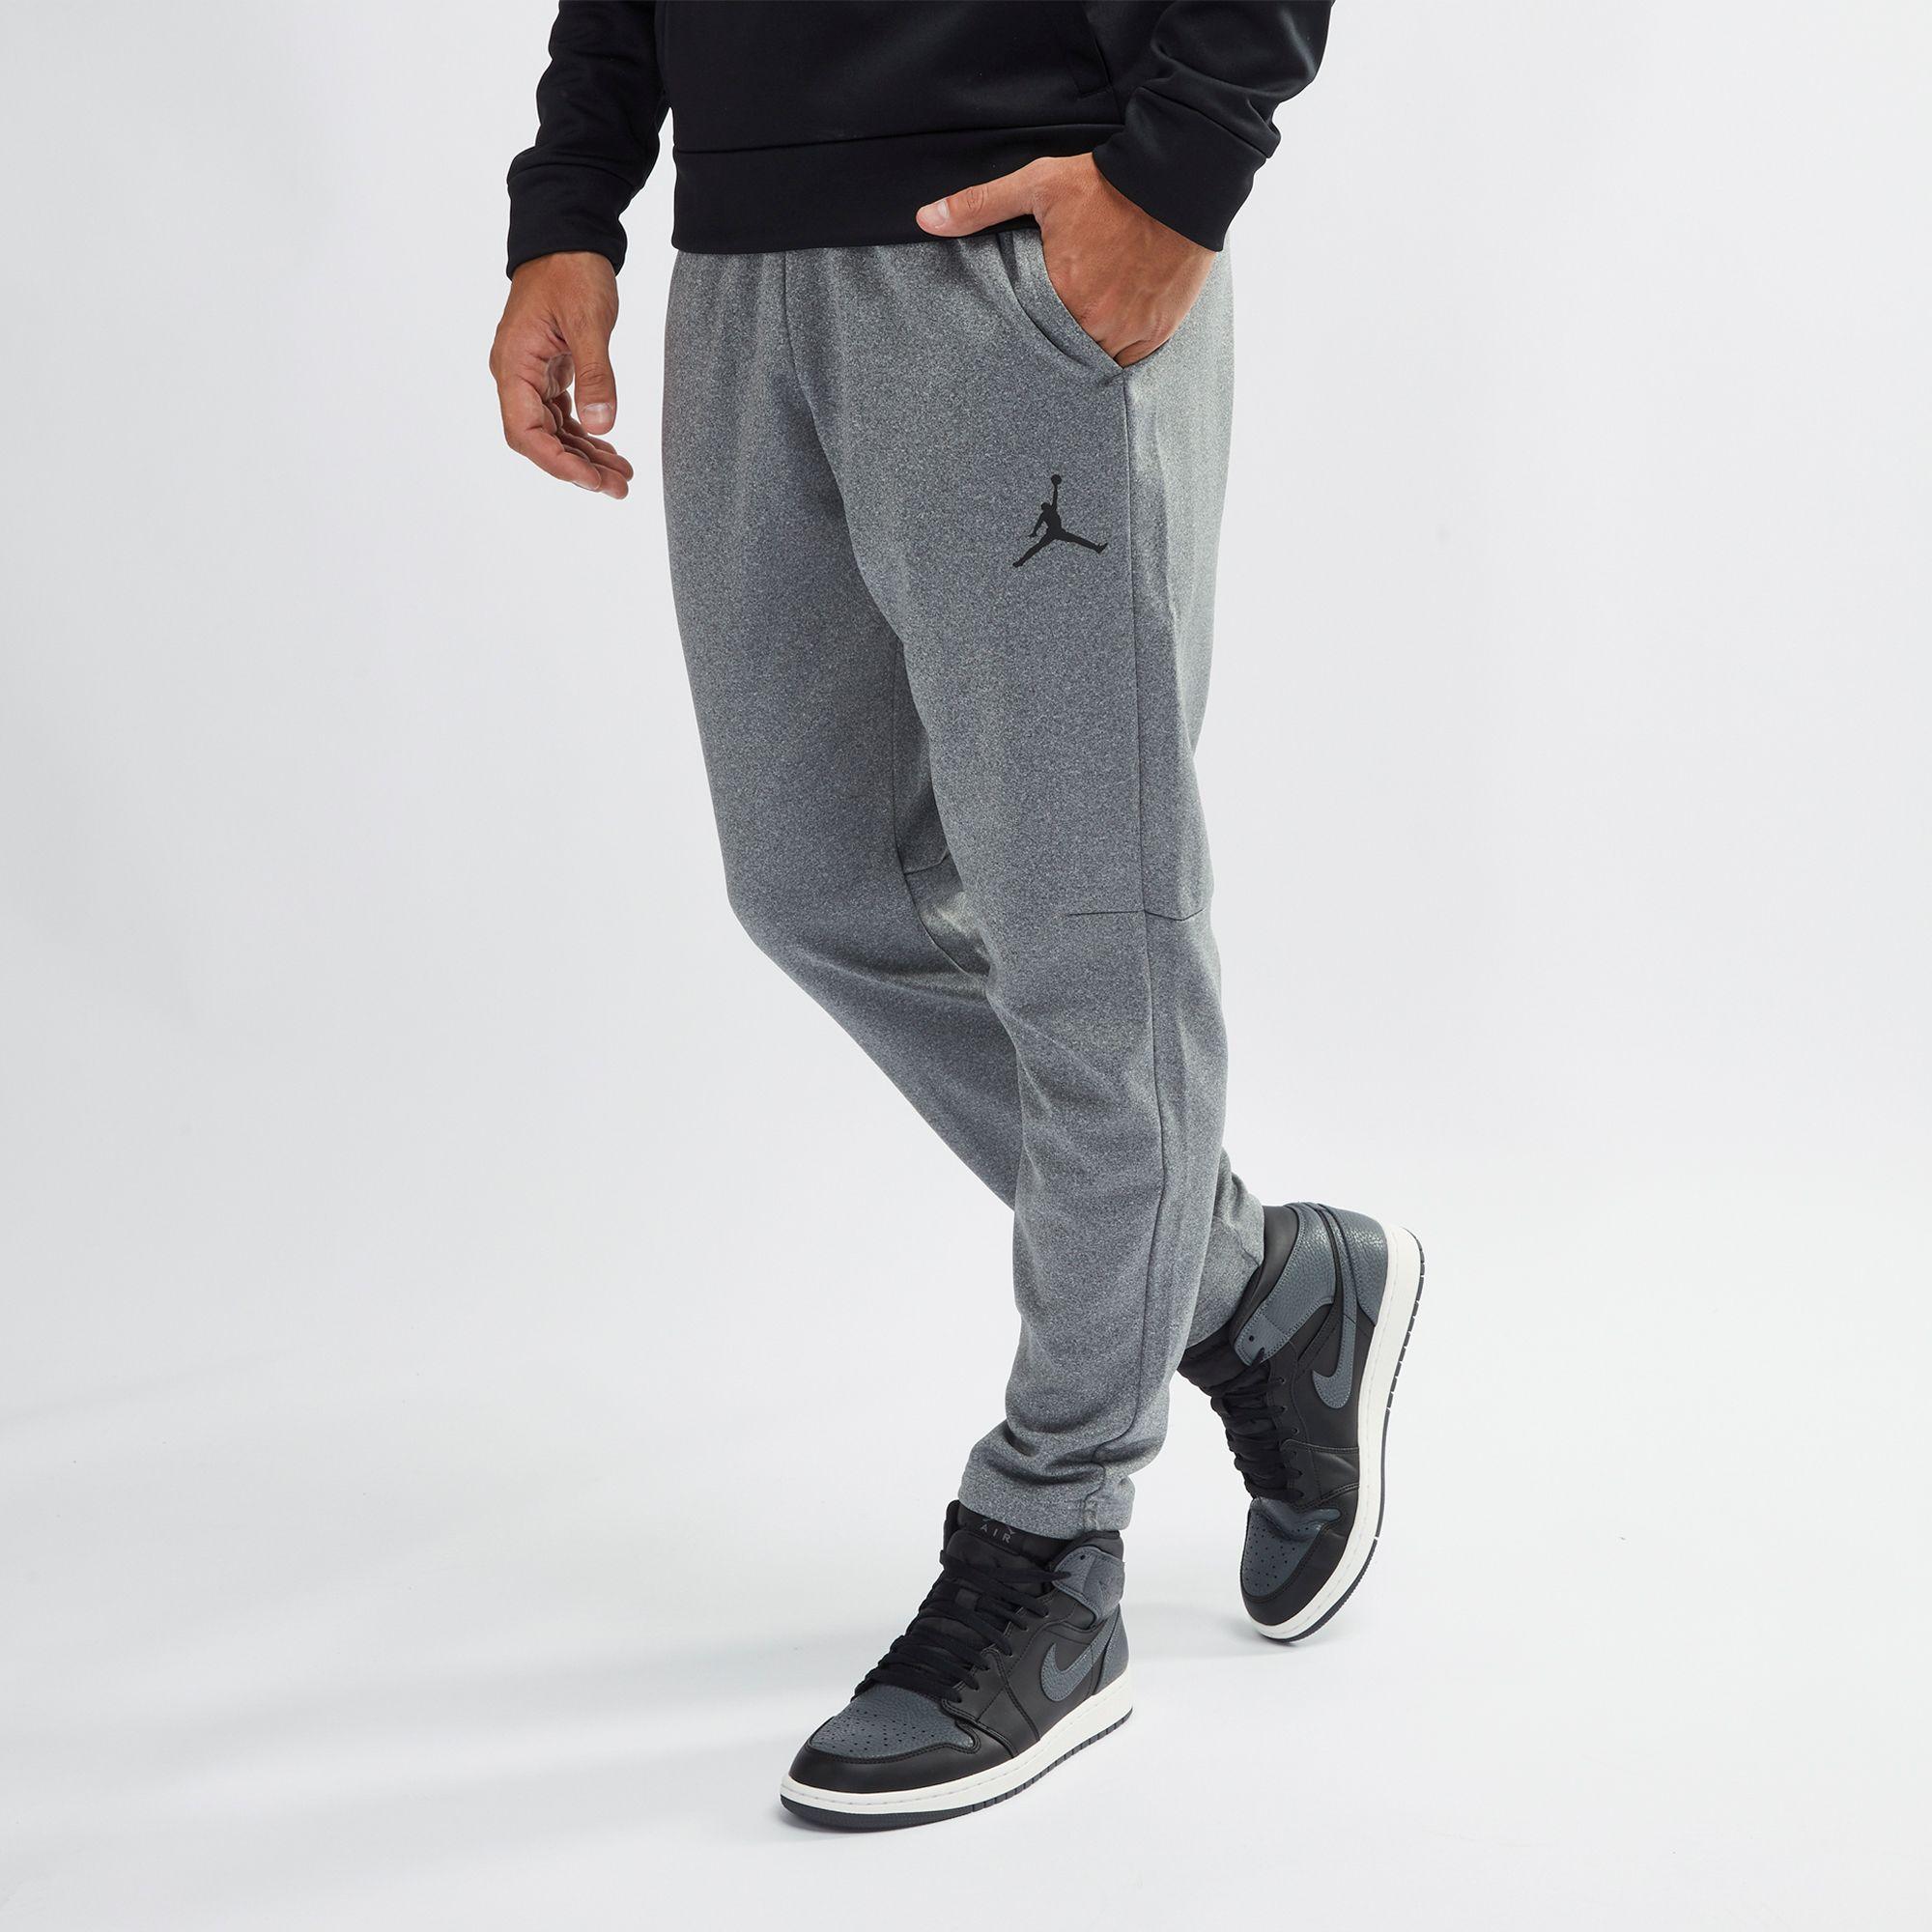 05f8c7f34fee9d Shop Grey Jordan Therma 23 Alpha Training Pants for Mens by Jordan